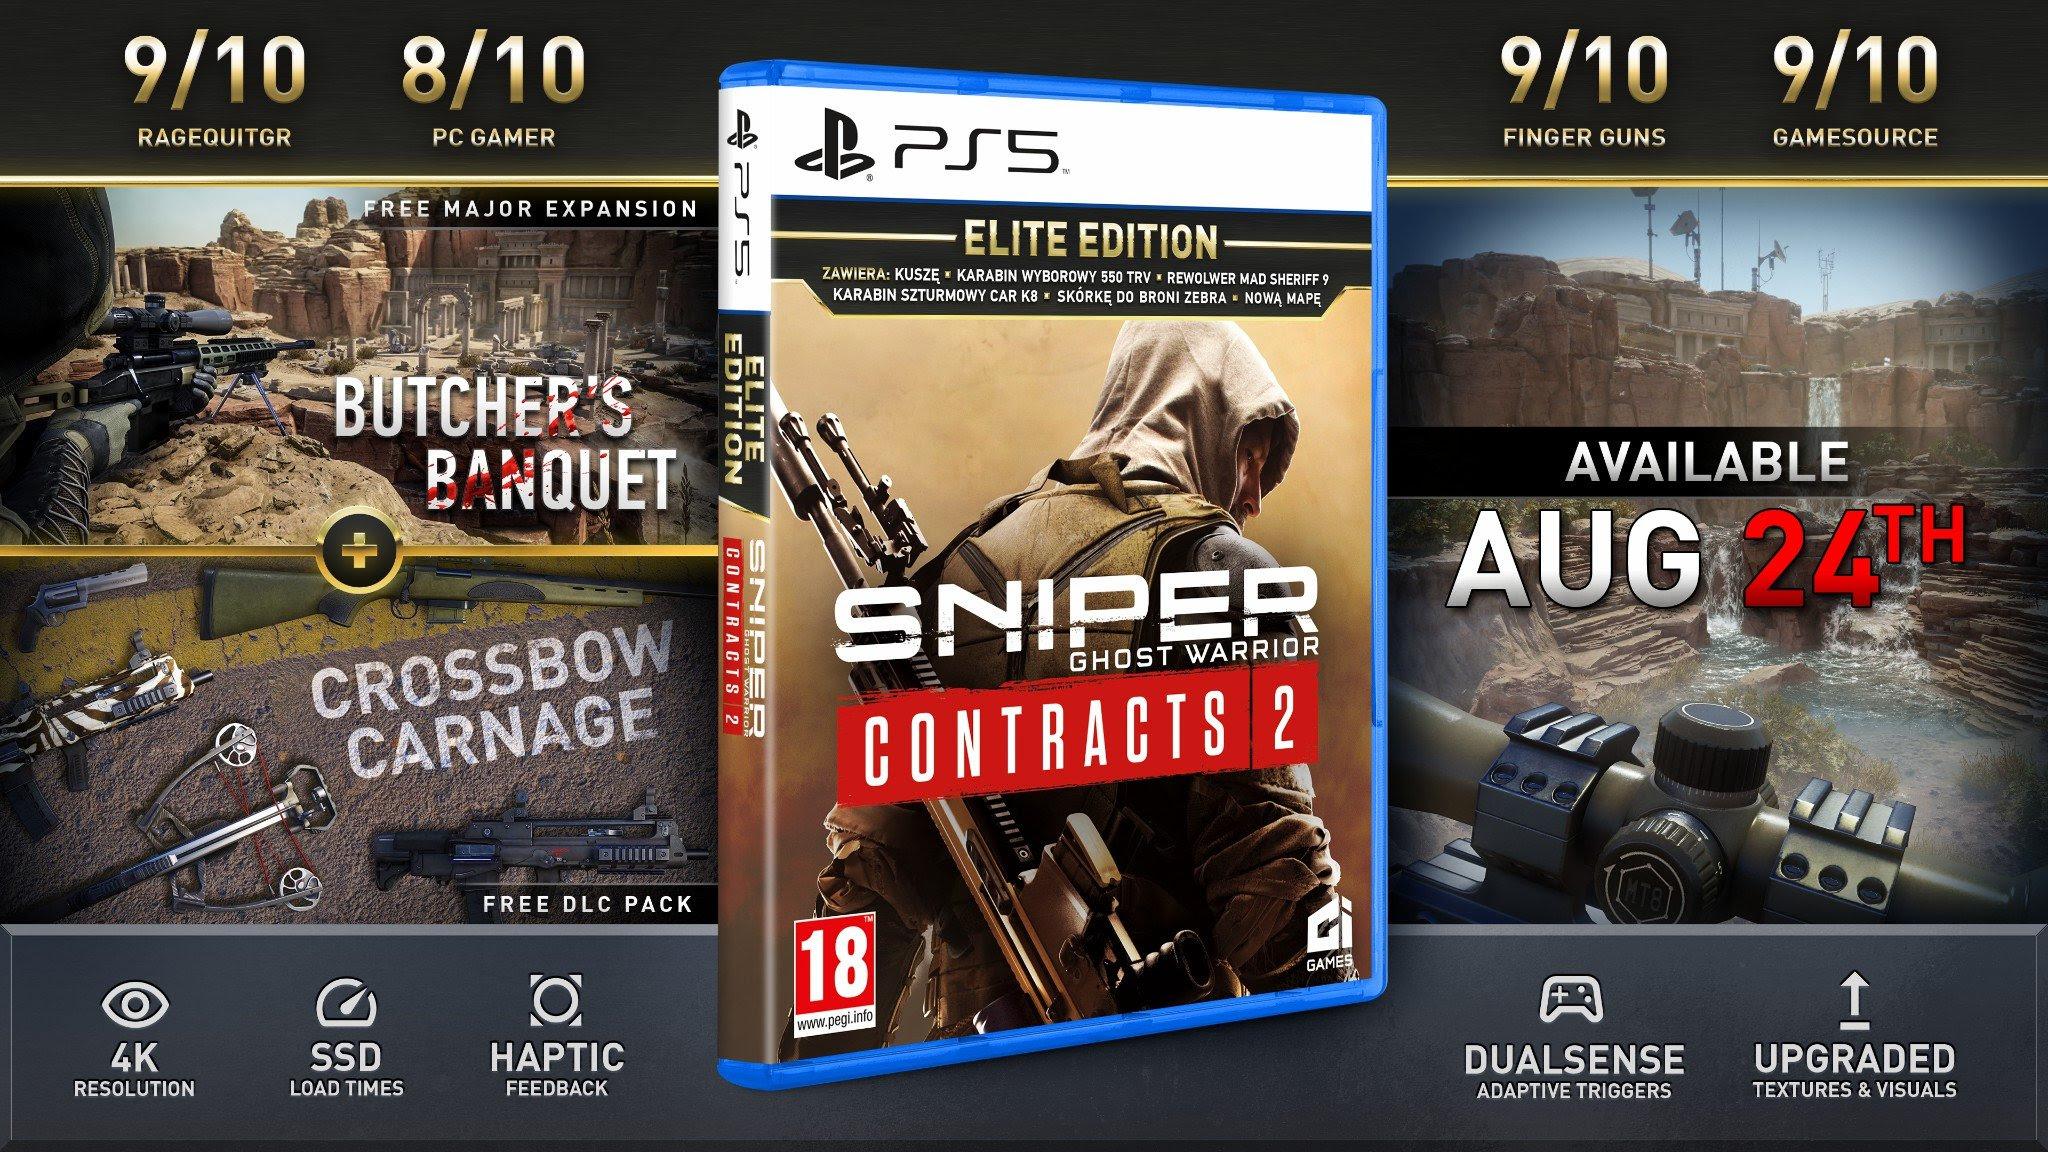 Sniper Ghost Warrior 2382021 3